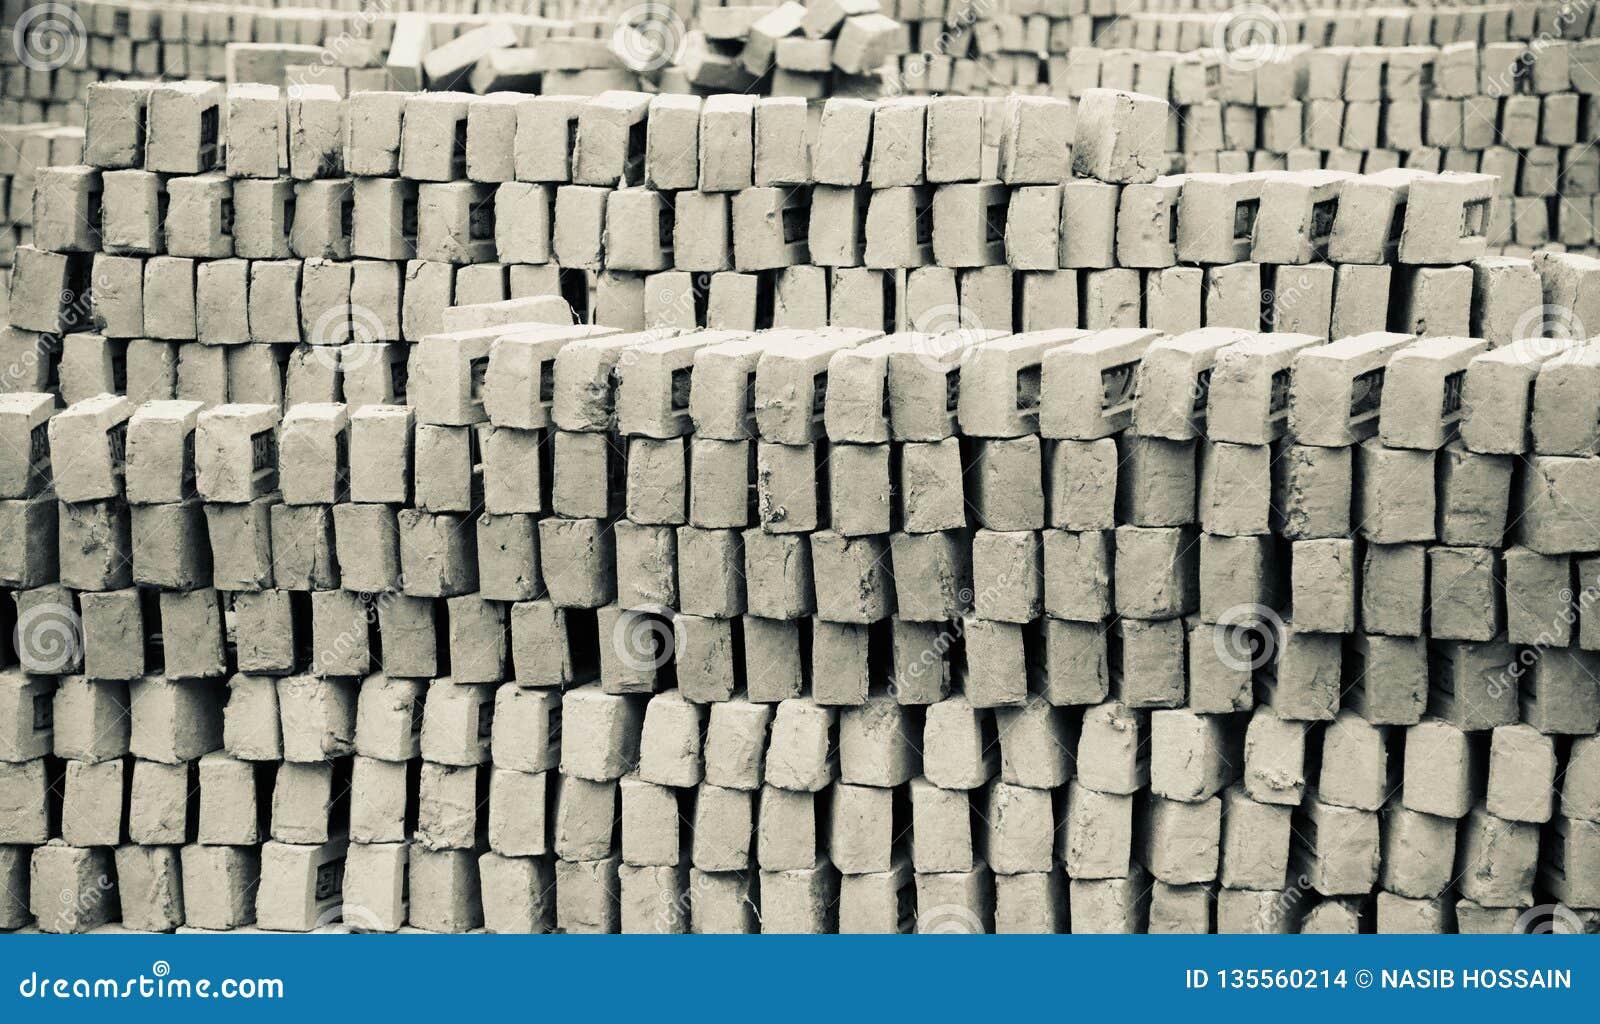 Stack of bricks around a bricks field